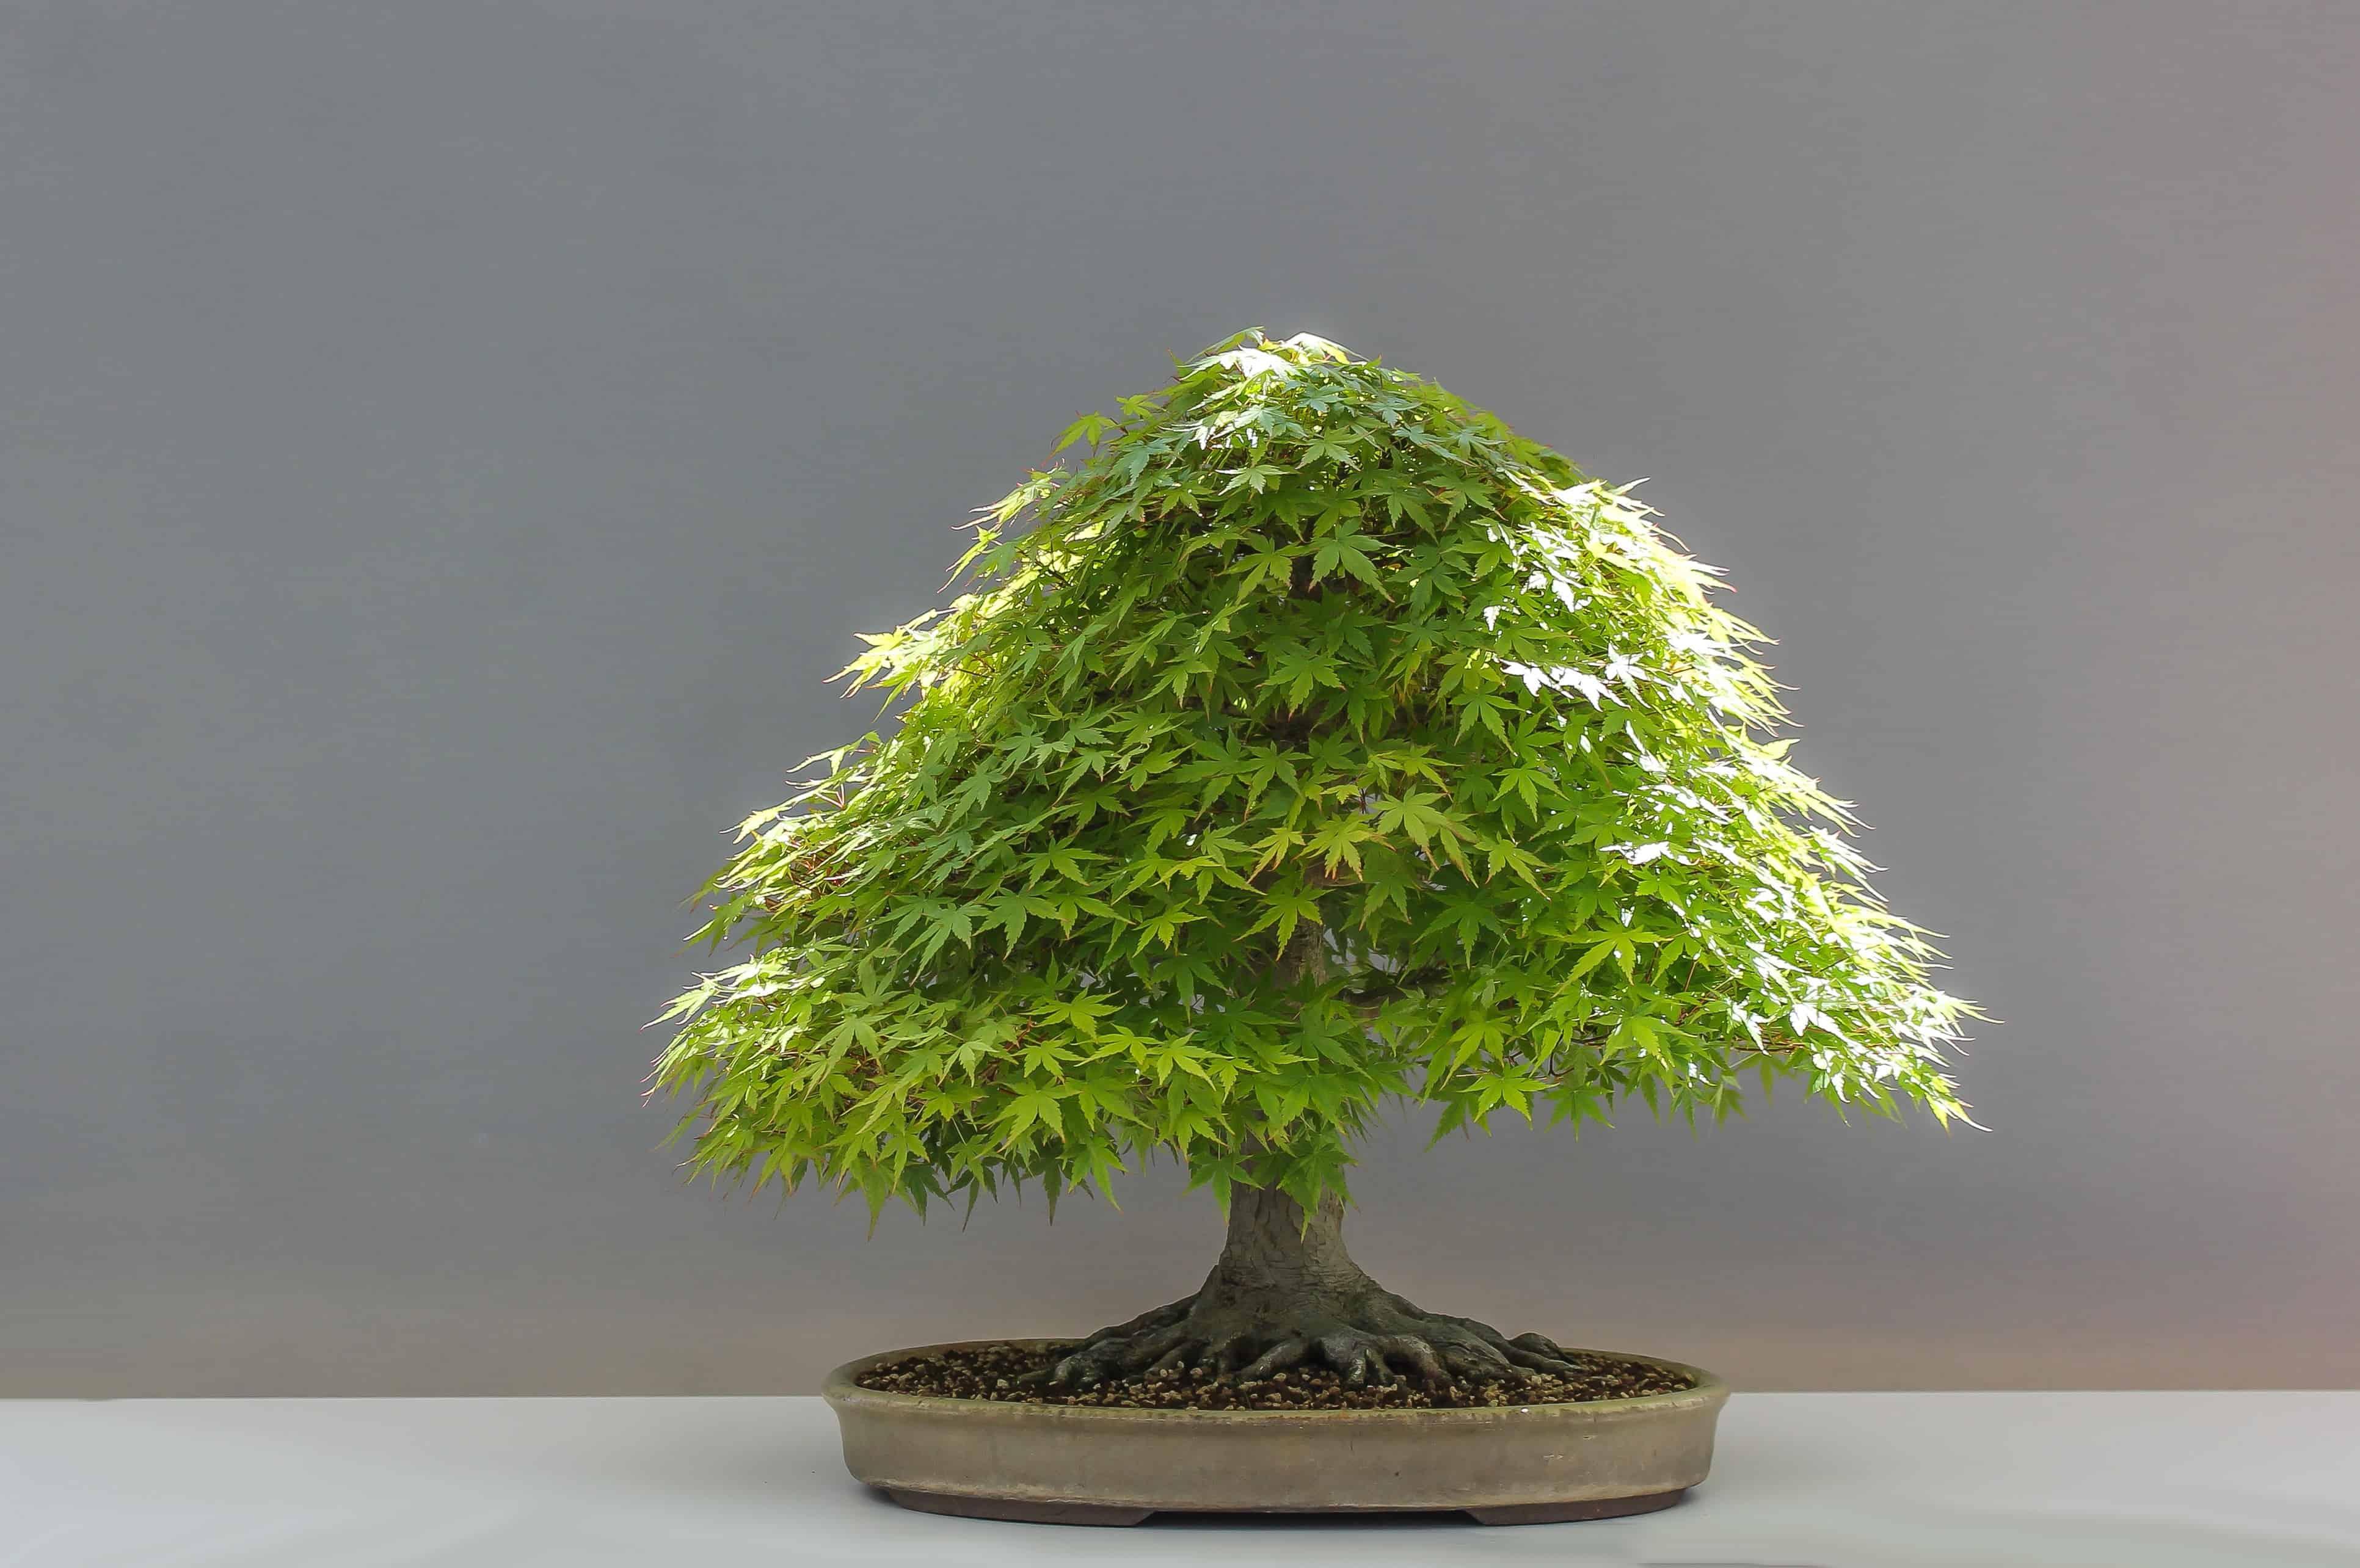 Kostenlose Bild: Baum, Bonsai, Pflanze, Natur, Kräuter ...